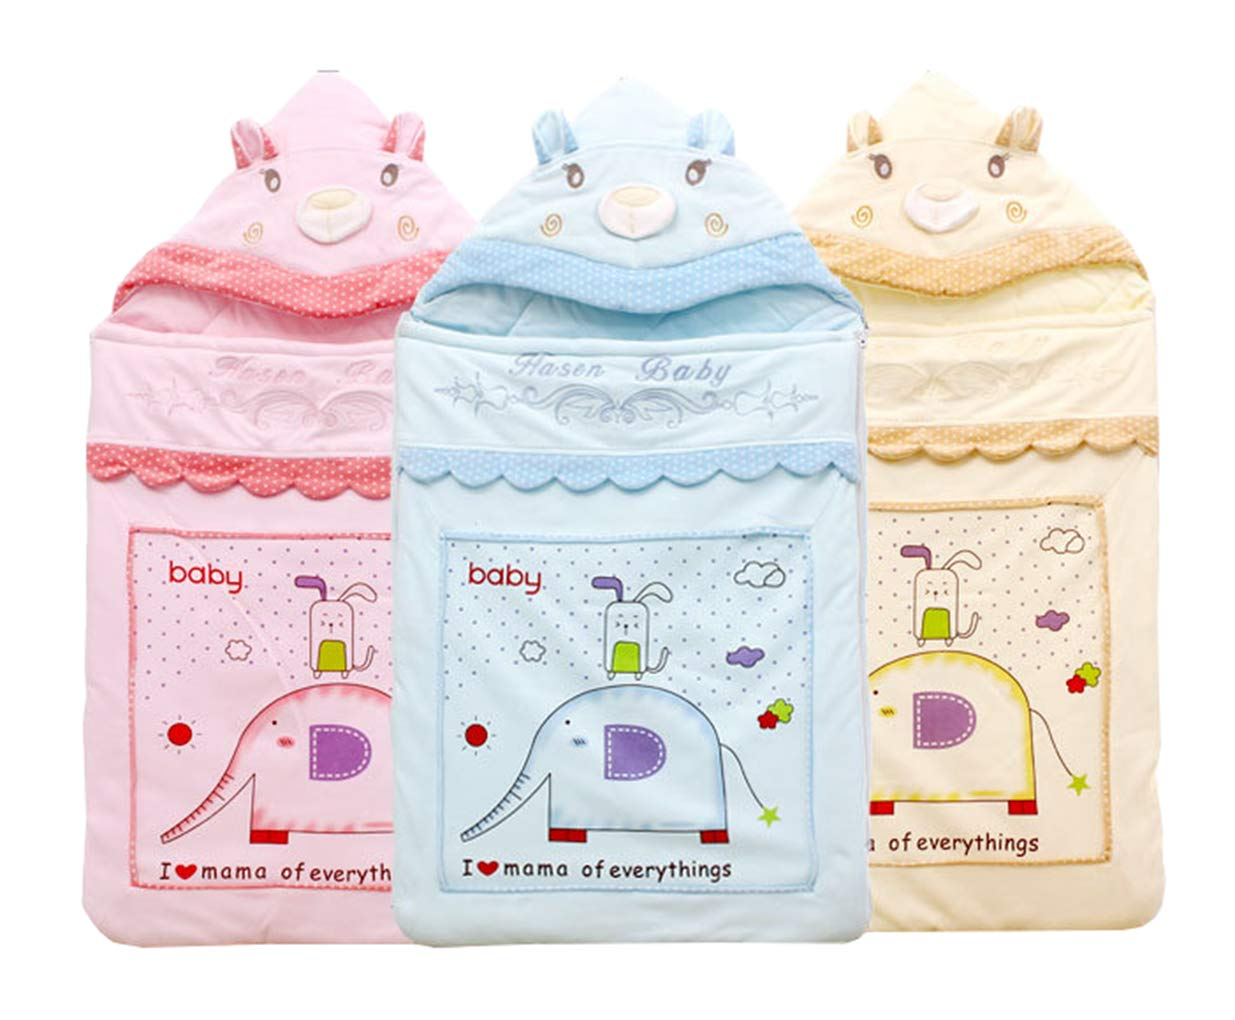 ML Saco de Dormir para bebés, bebé, Dibujos Animados, recién Nacido Lindo, algodón cálido Que se Espesa, Abrazo, niño y niña (0-12 Meses),Blue,S: Amazon.es: ...